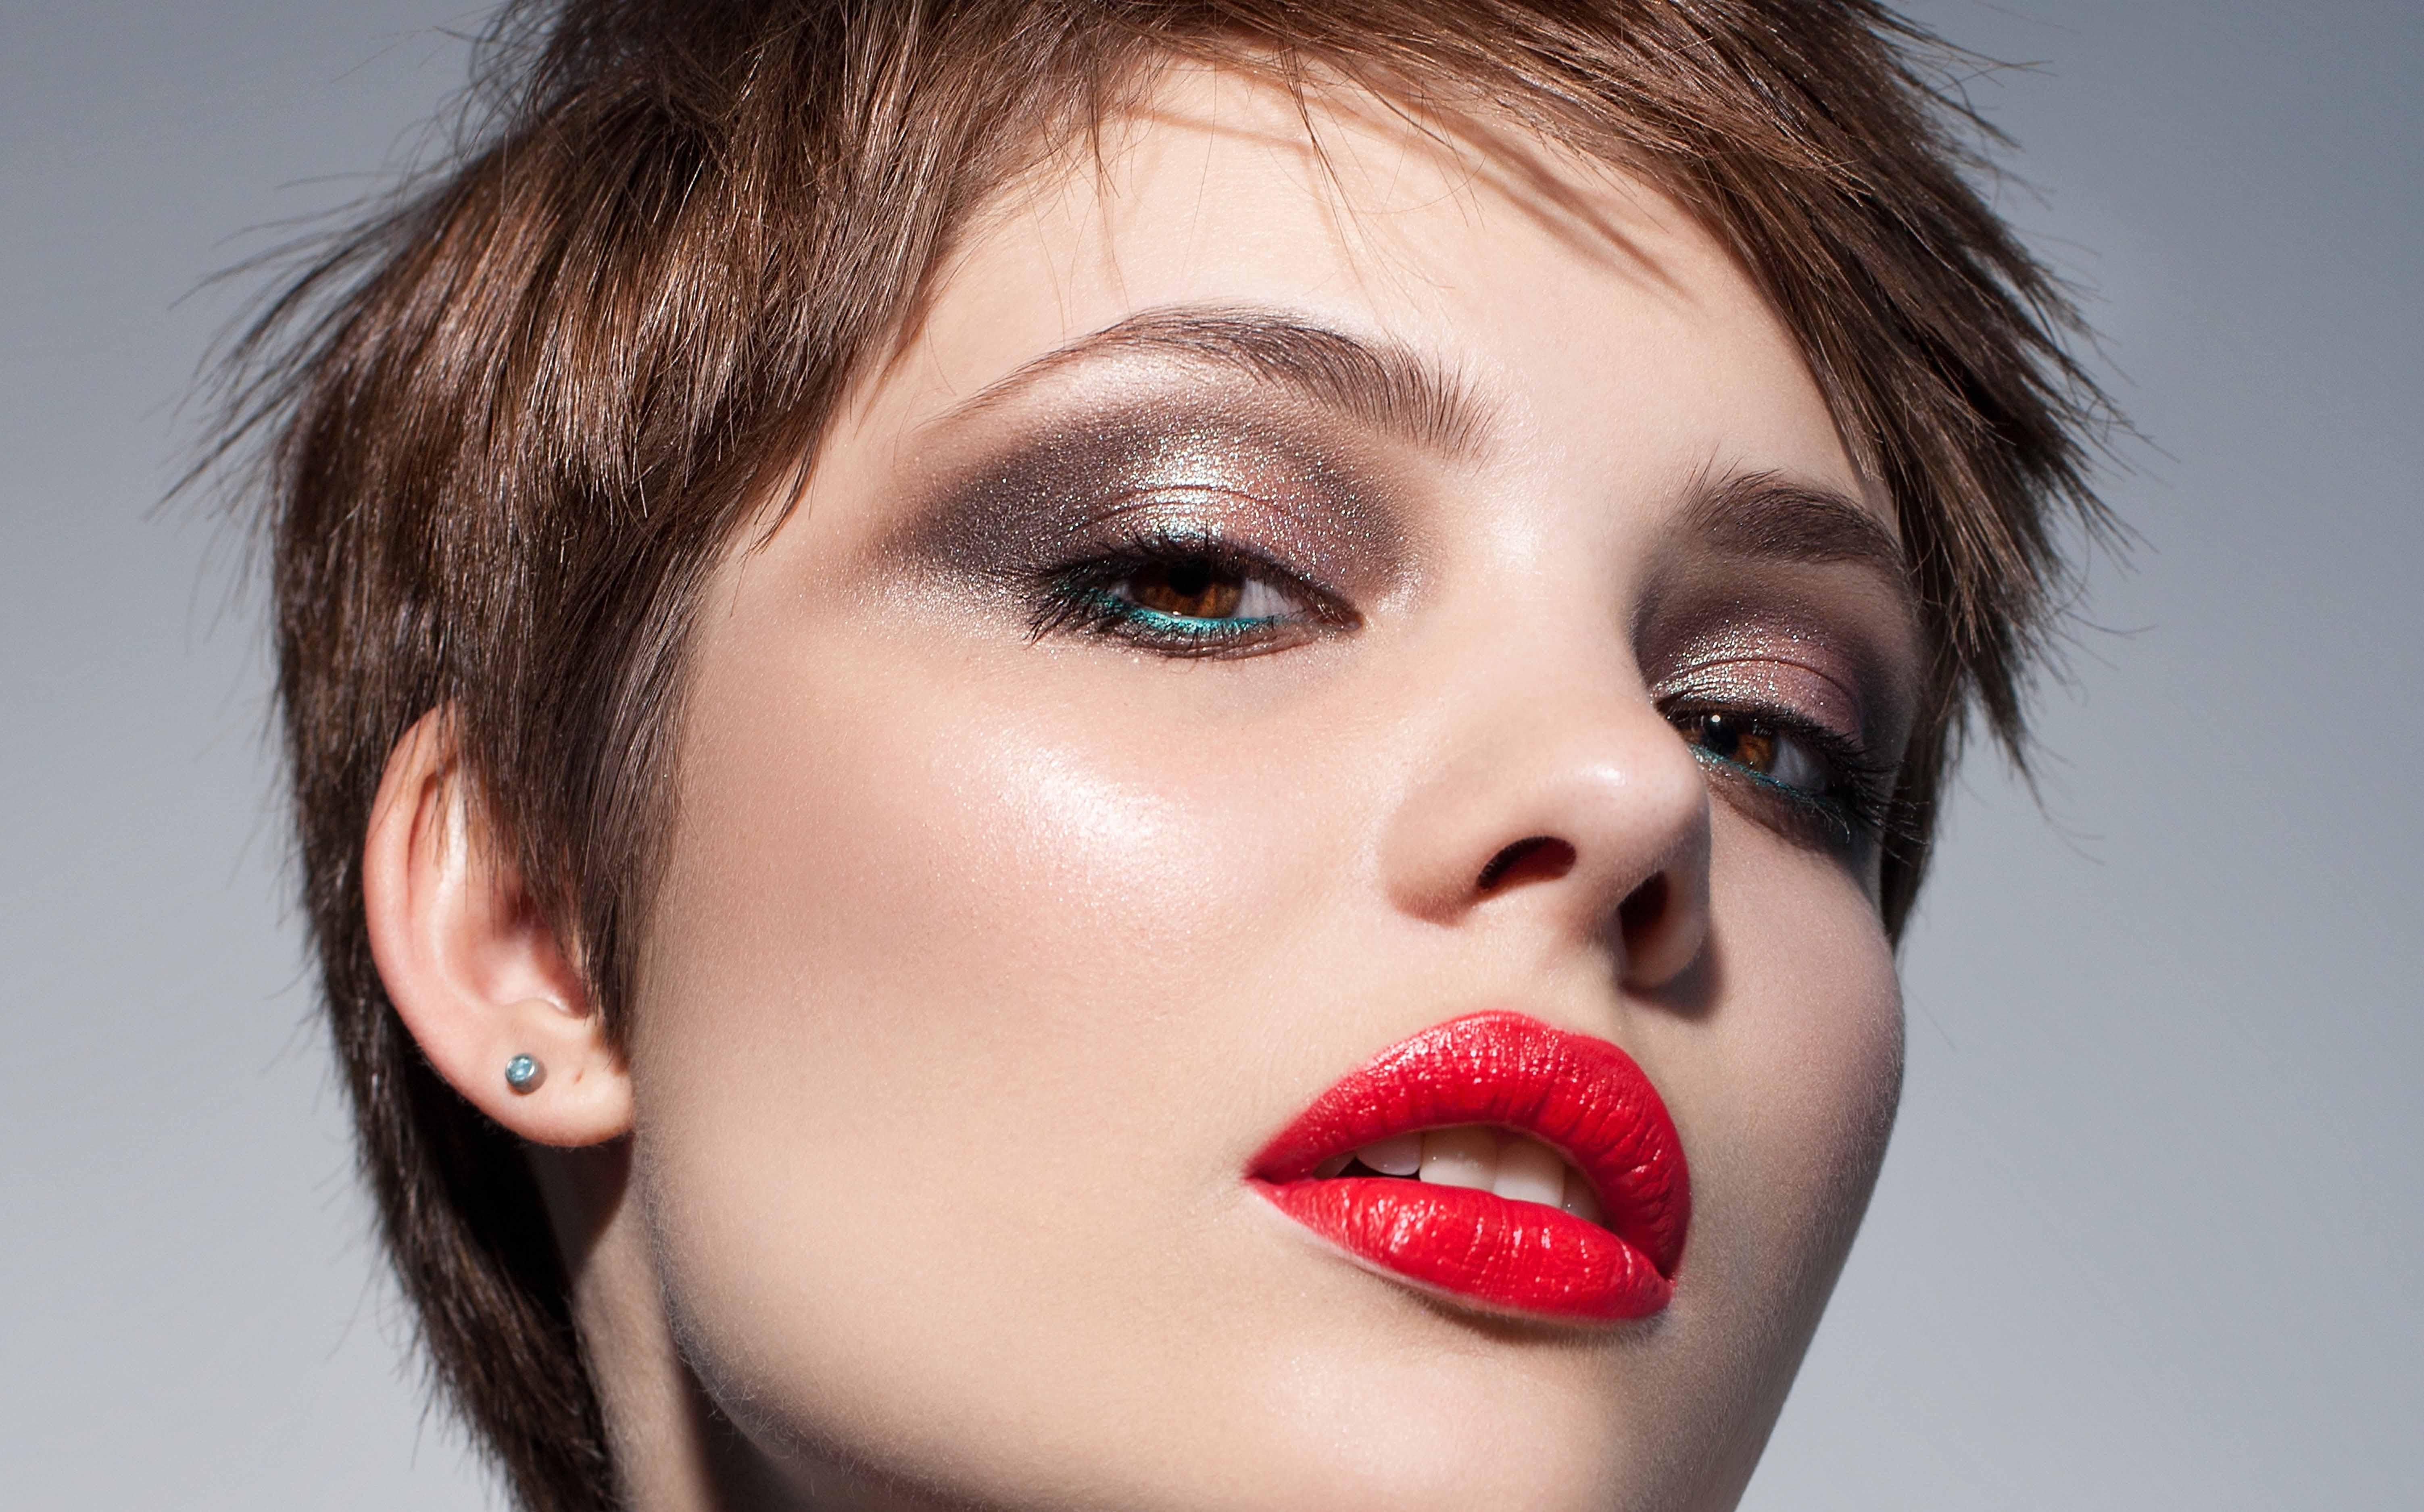 zephirparrucchieri-makeup-autunno-ascona.jpg